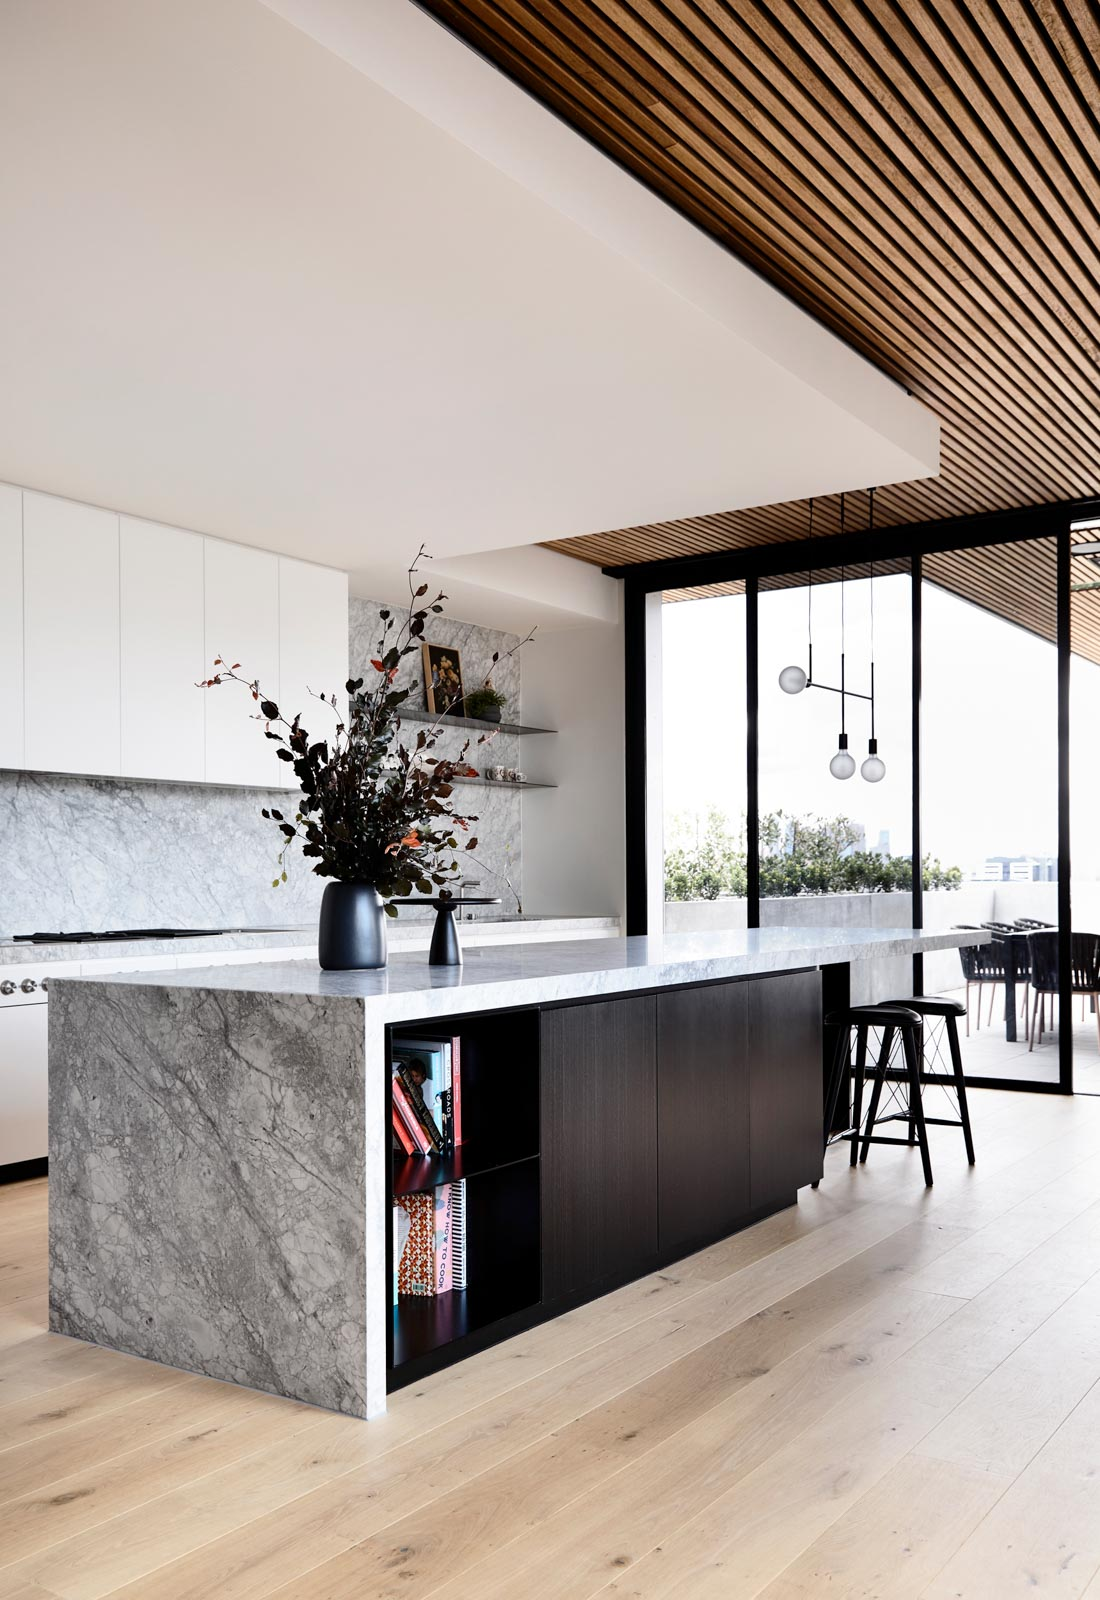 Contemporary/Modern Home Design cover image